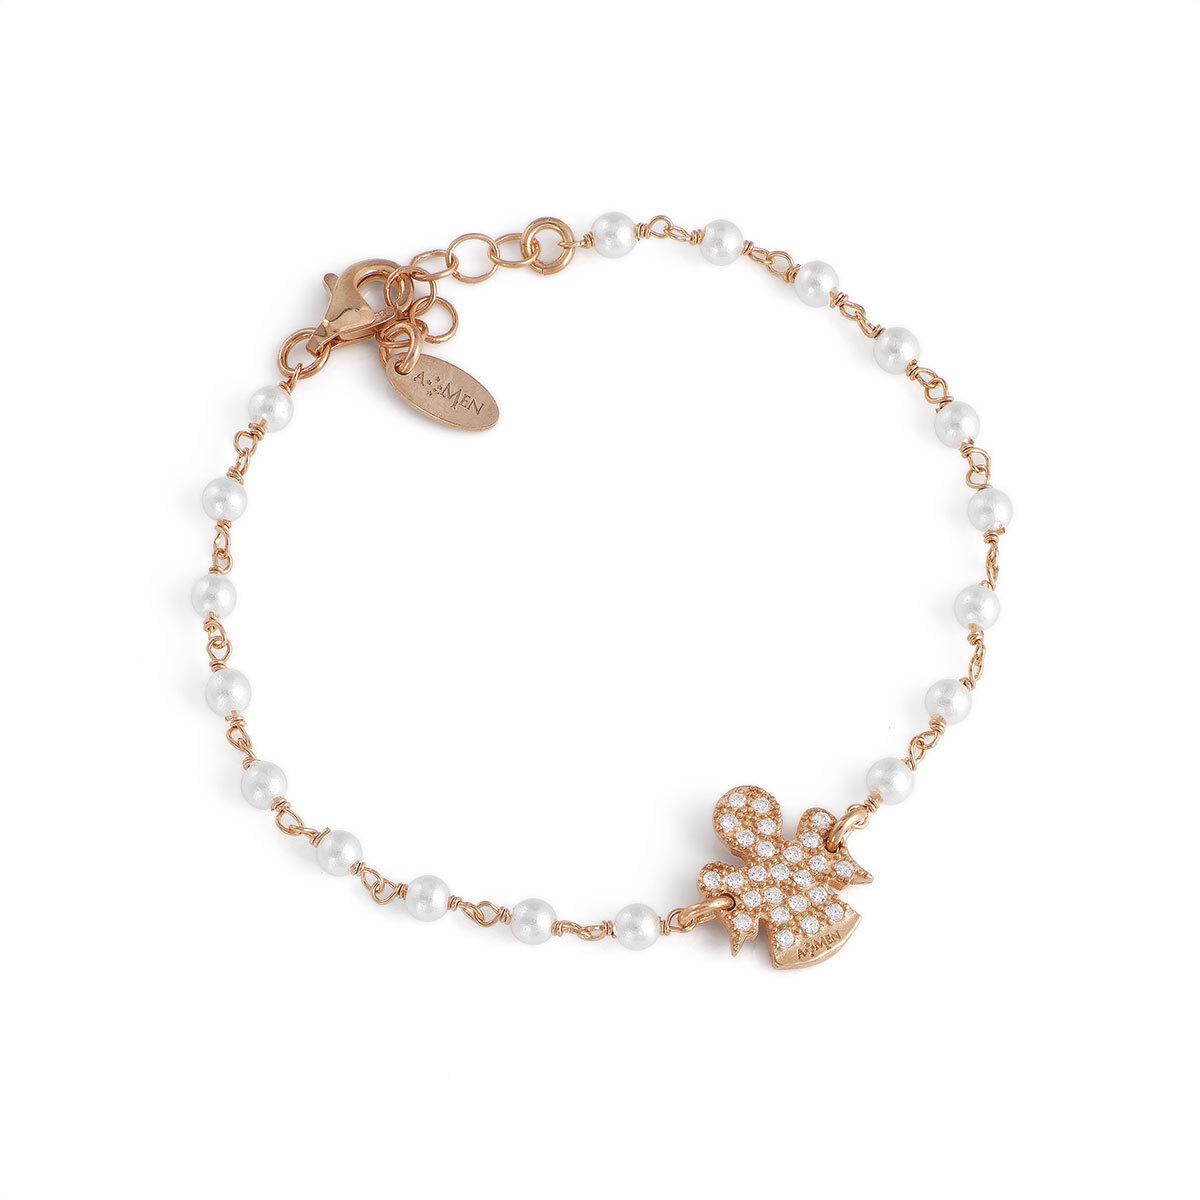 7906af52396ee6 Bracciale angeli AG925 con perle swarovski e zirconi bianchi